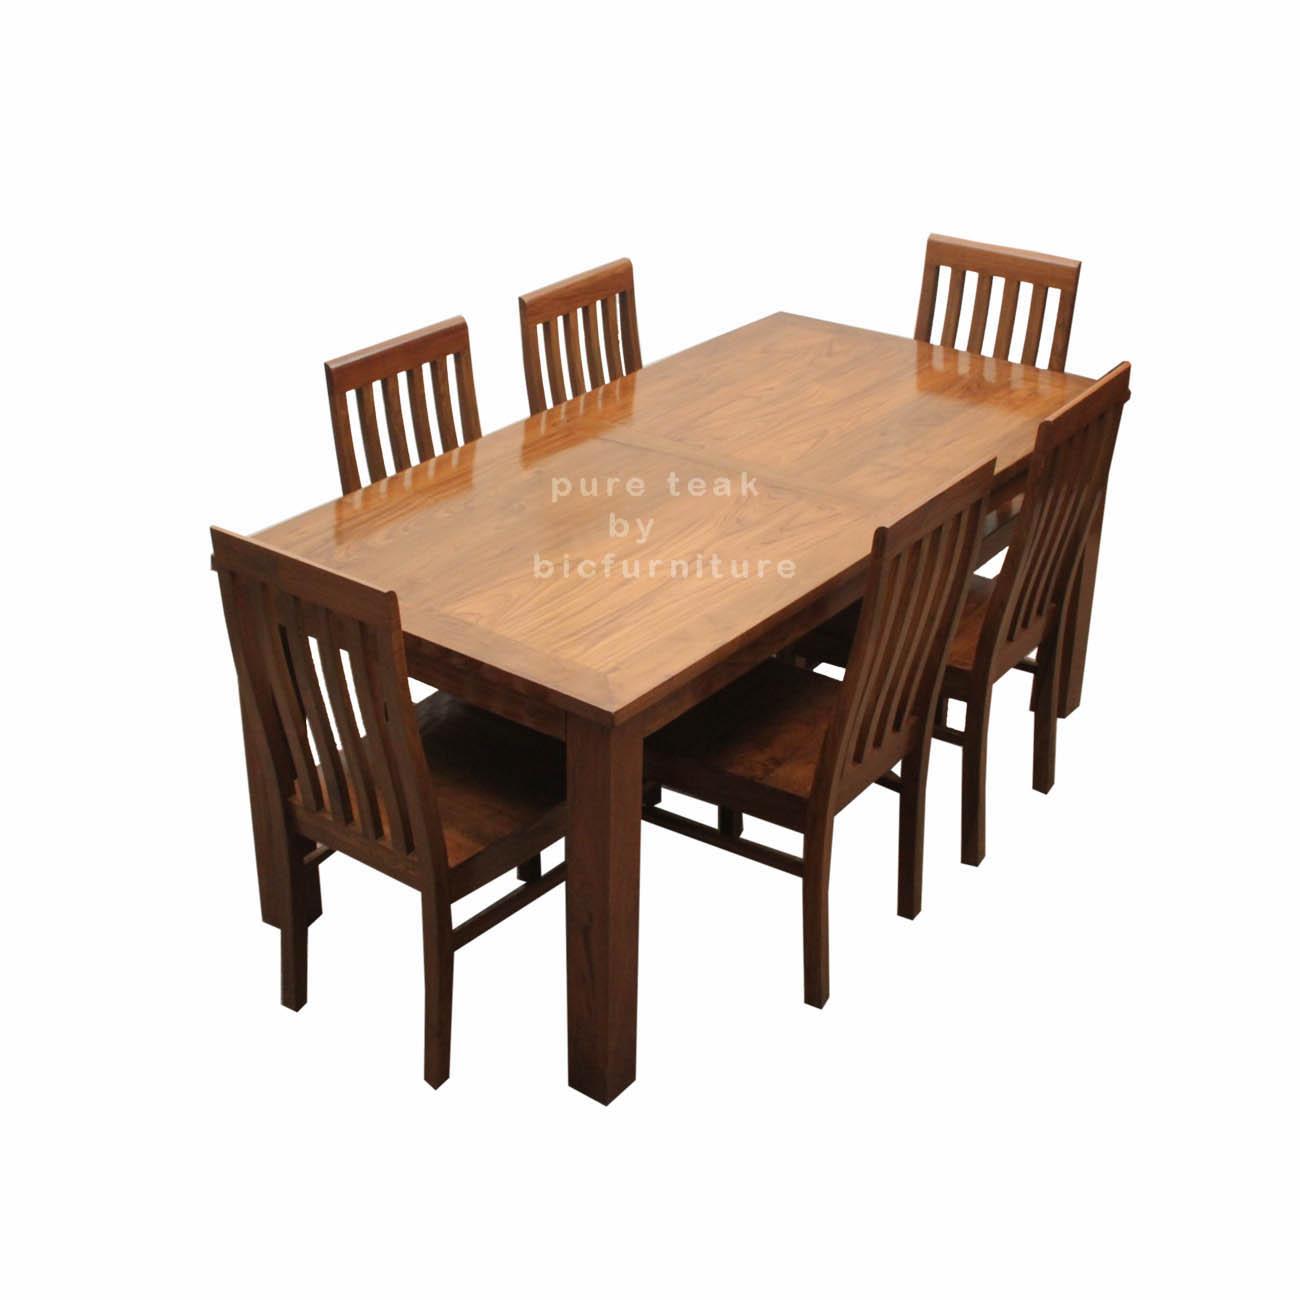 Teak Wood Dining Set In Pure, Teak Wood Dining Room Table